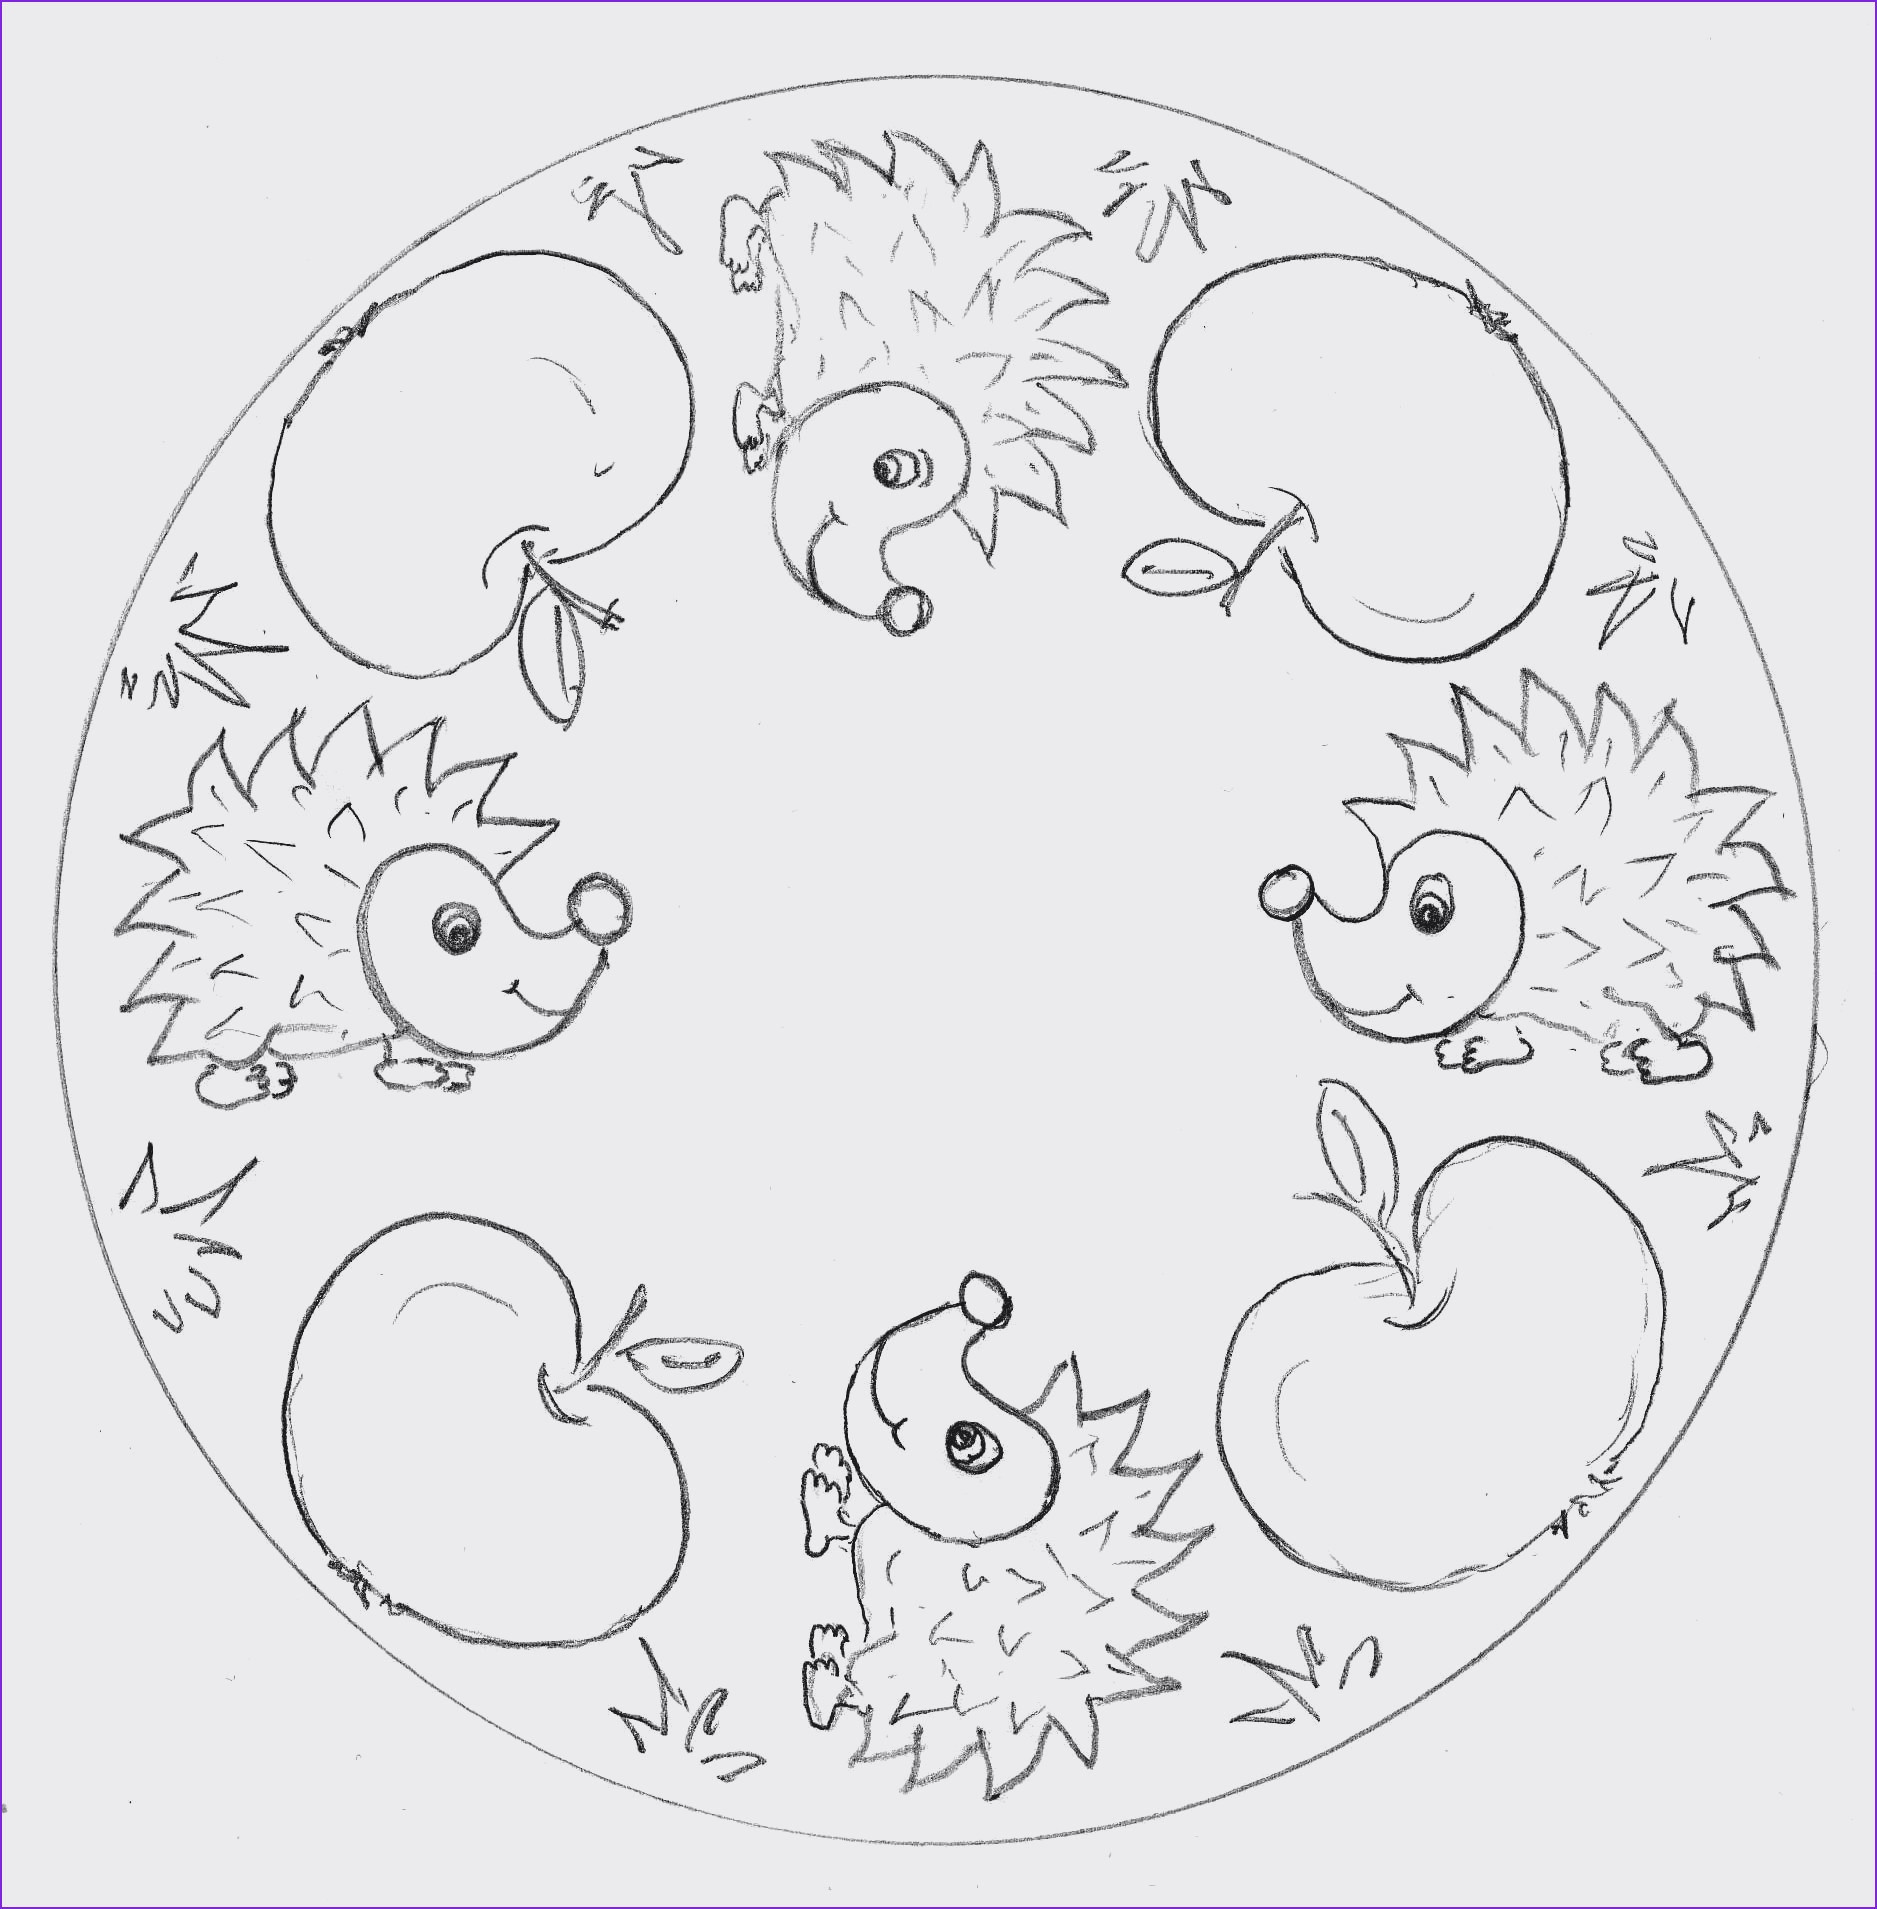 Nashorn Zum Ausmalen Neu 40 Entwurf Ausmalbilder Mandala Herbst